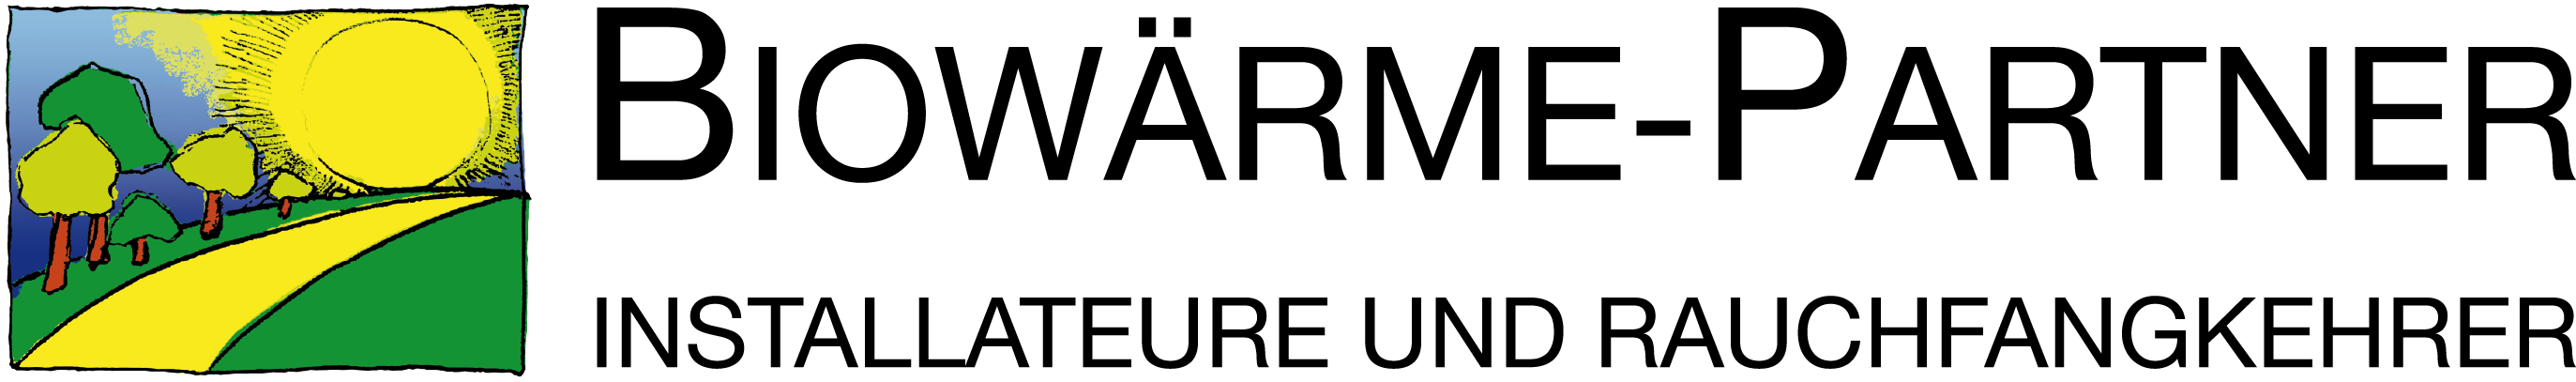 Biowärmepartner